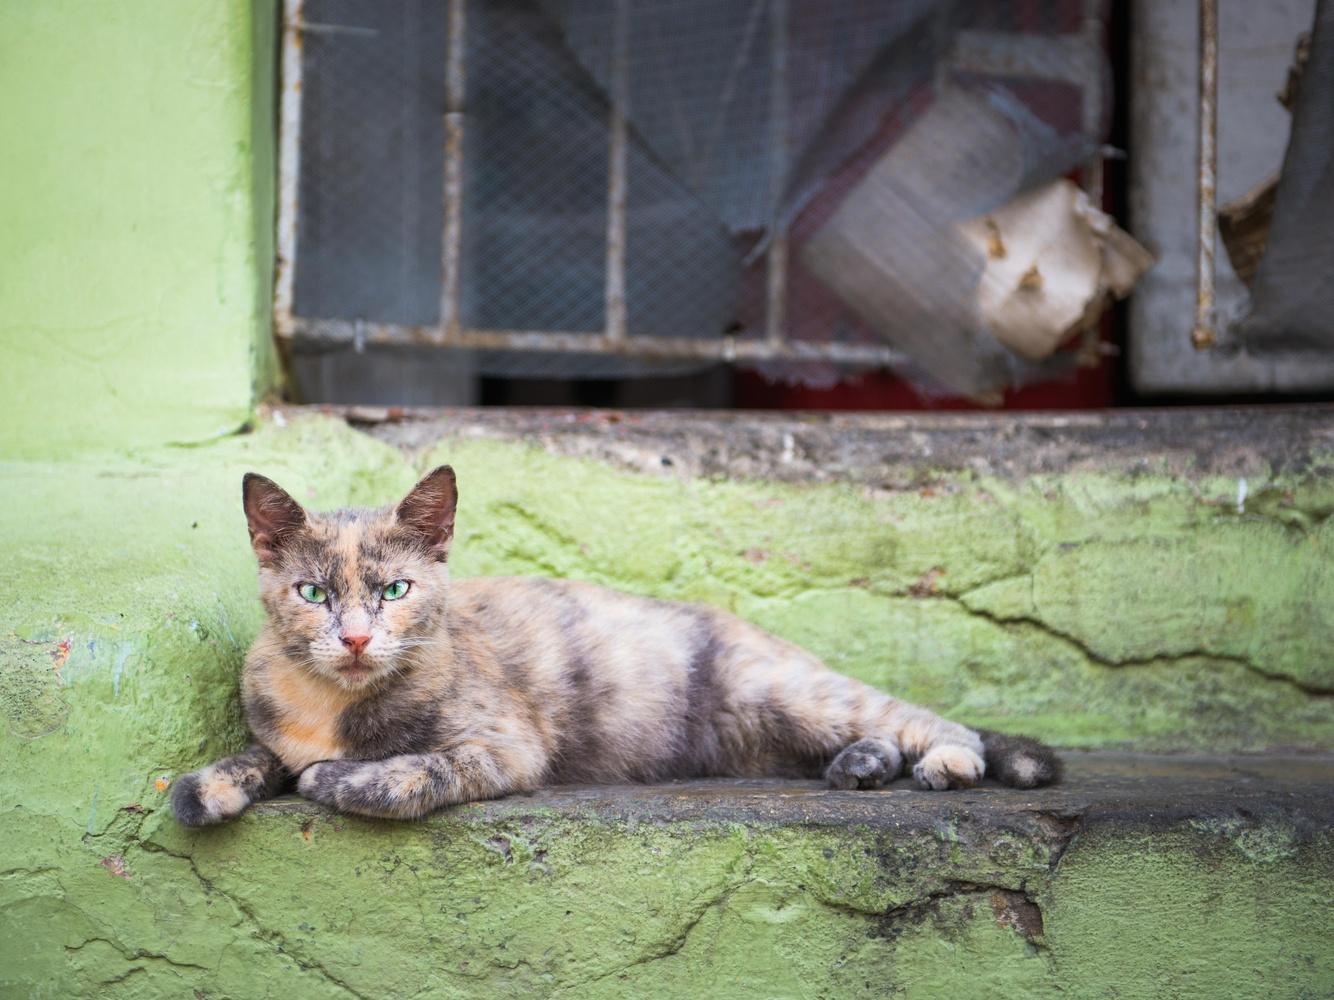 The street cat of Cartagena by David Mitchell